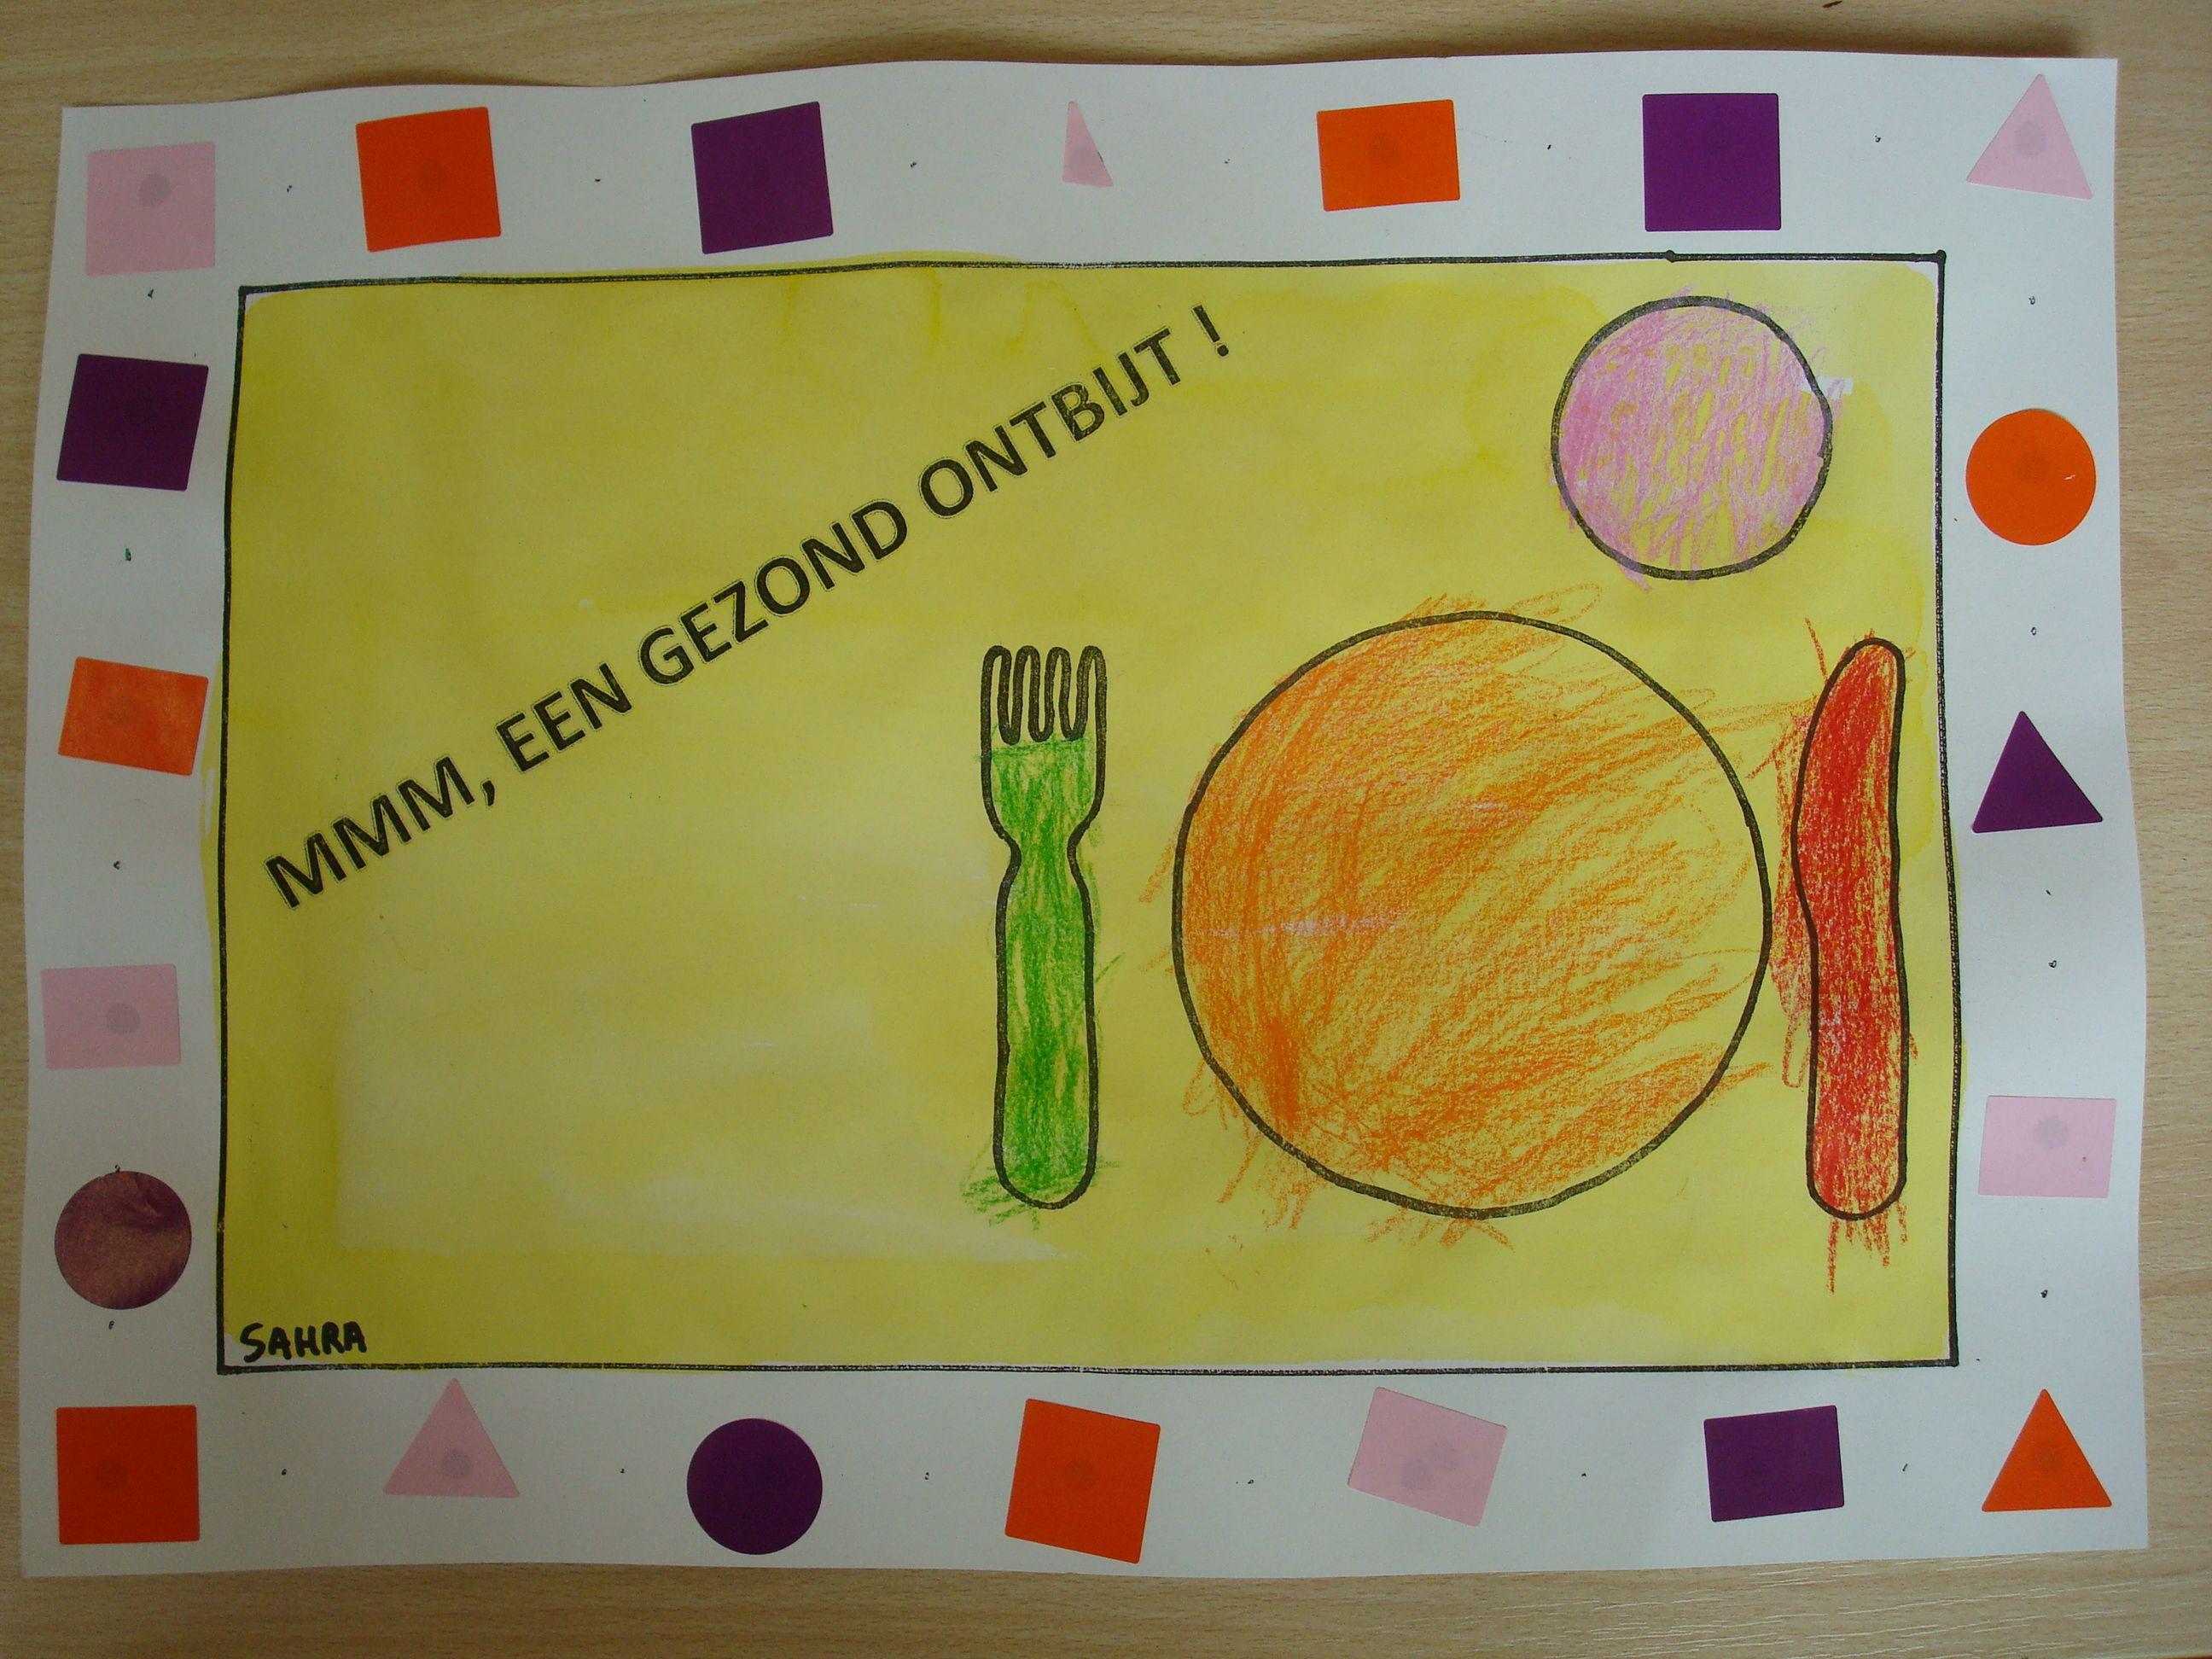 Onderlegger Kleuropdracht En Kleurcode Leggen Gezond Thema Voeding